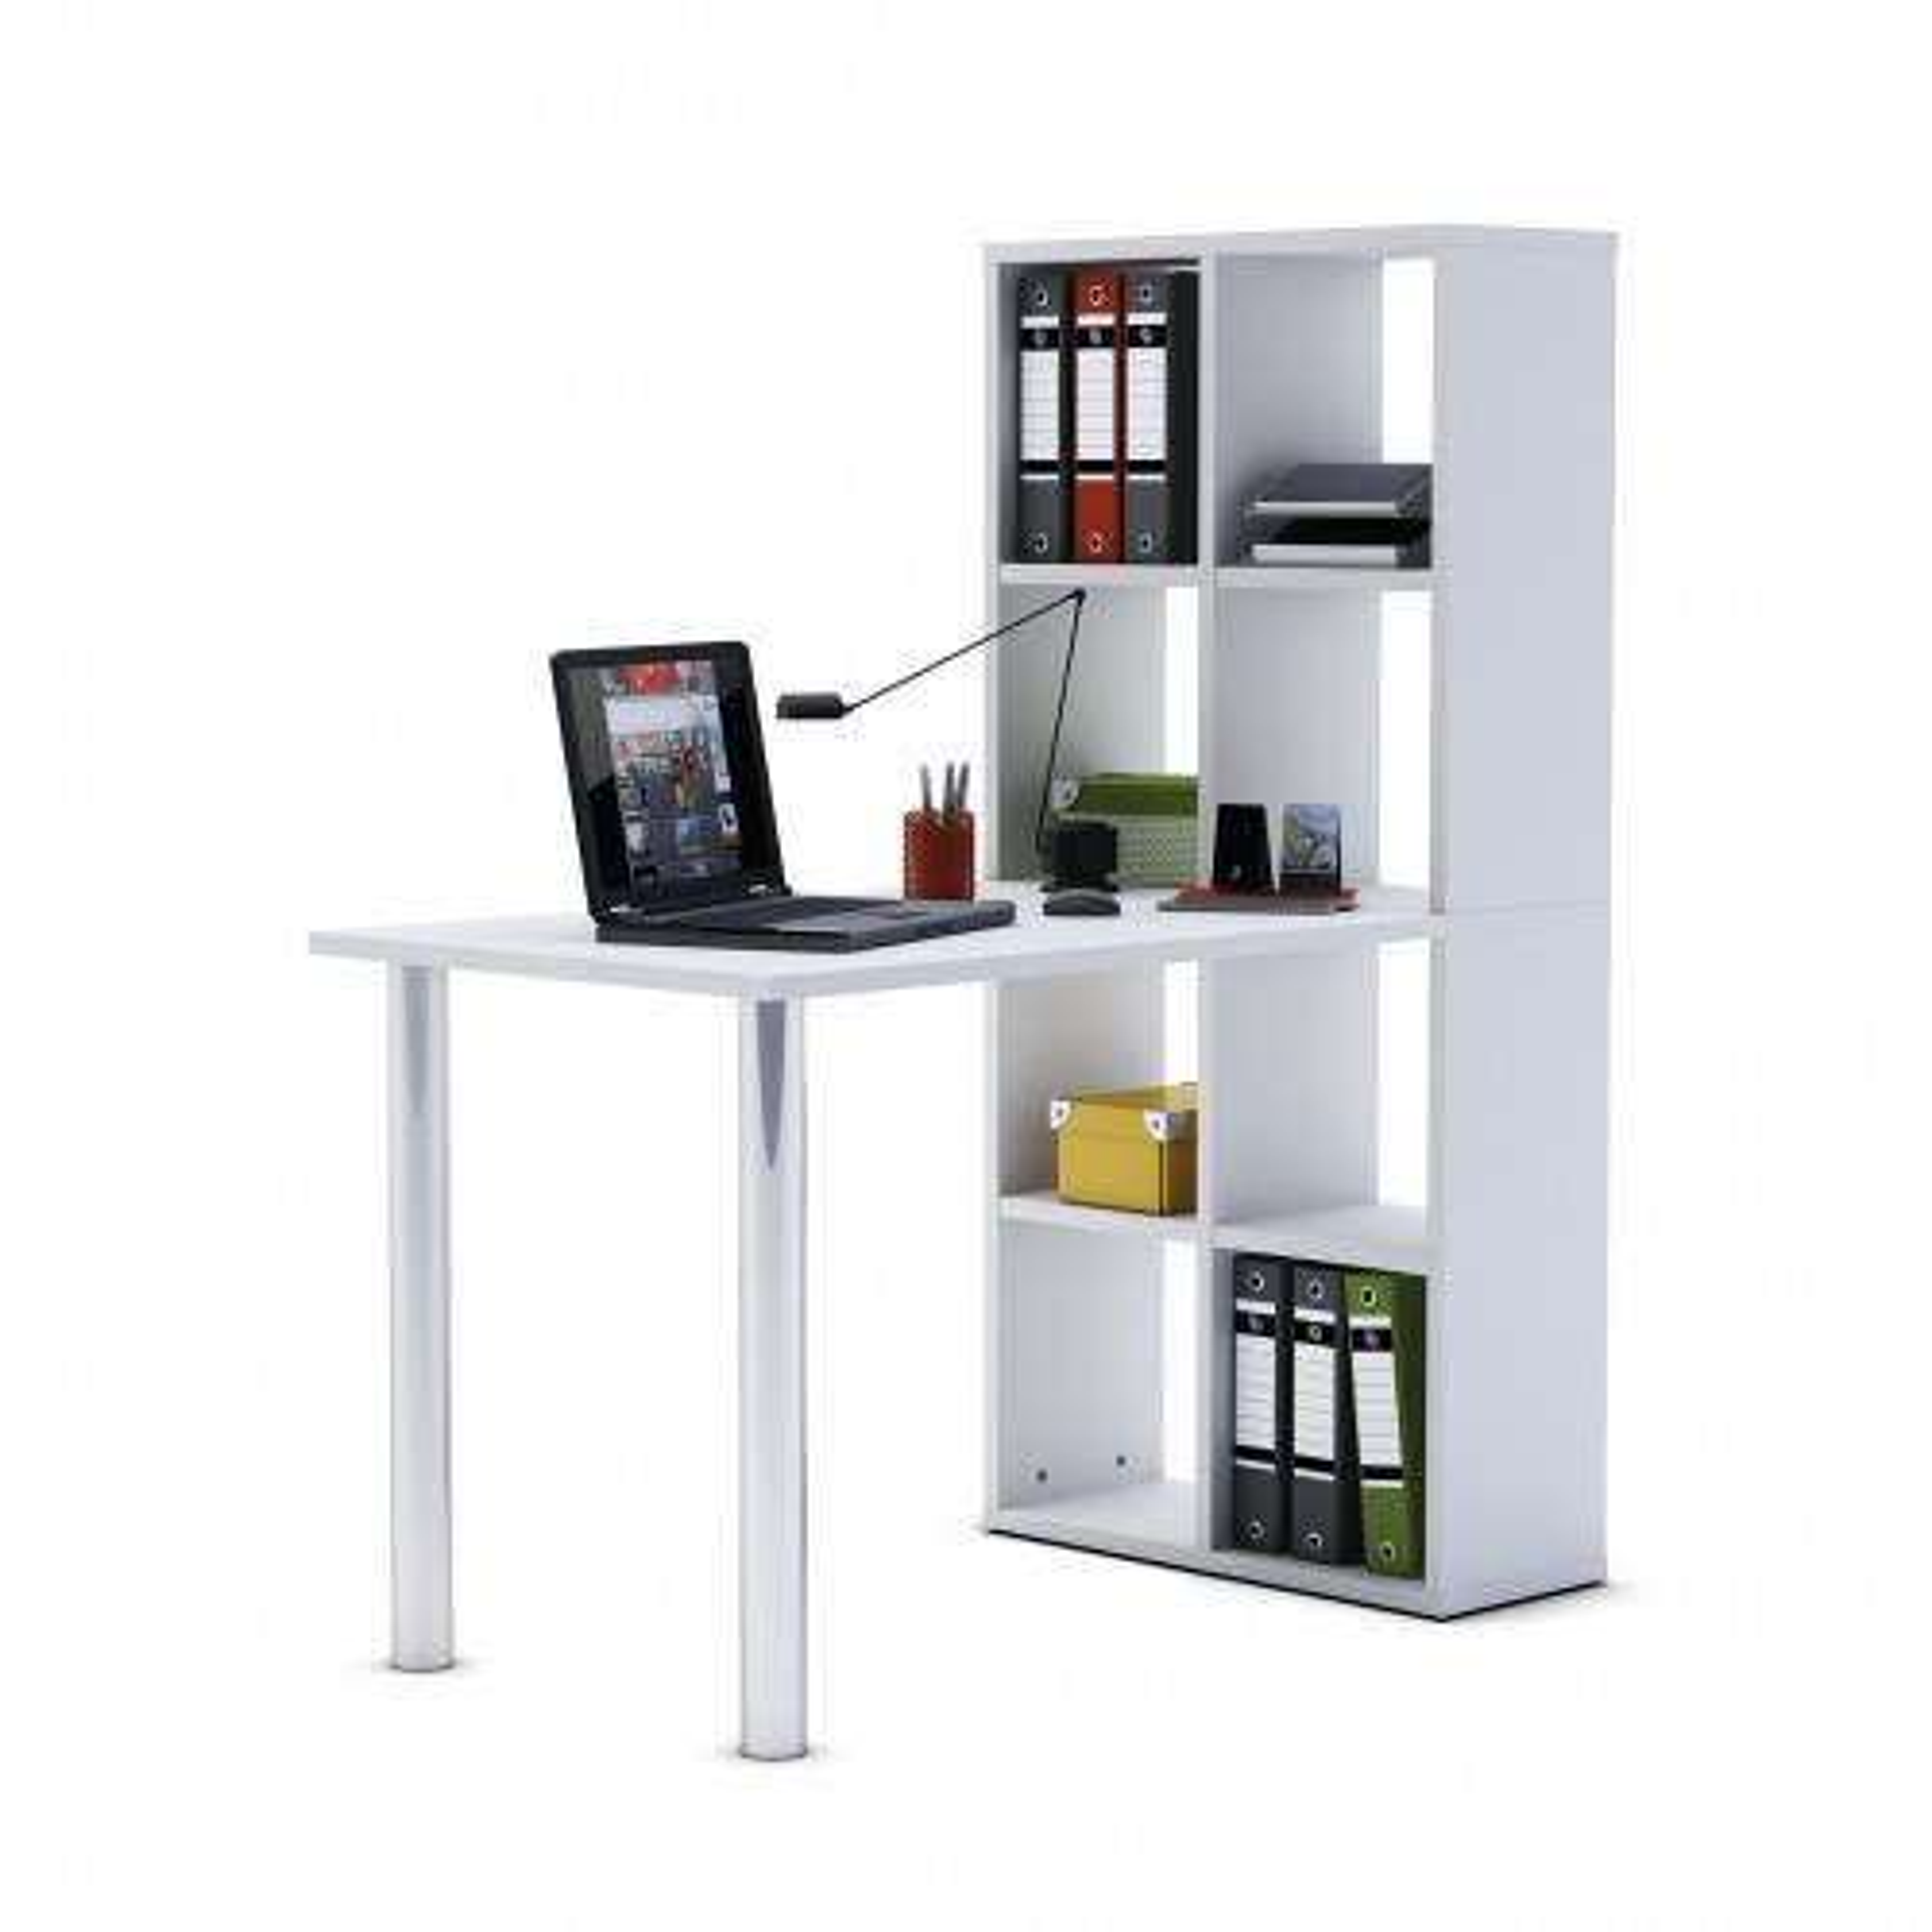 Bureau bibliothèque 8 niches blanc en MDF